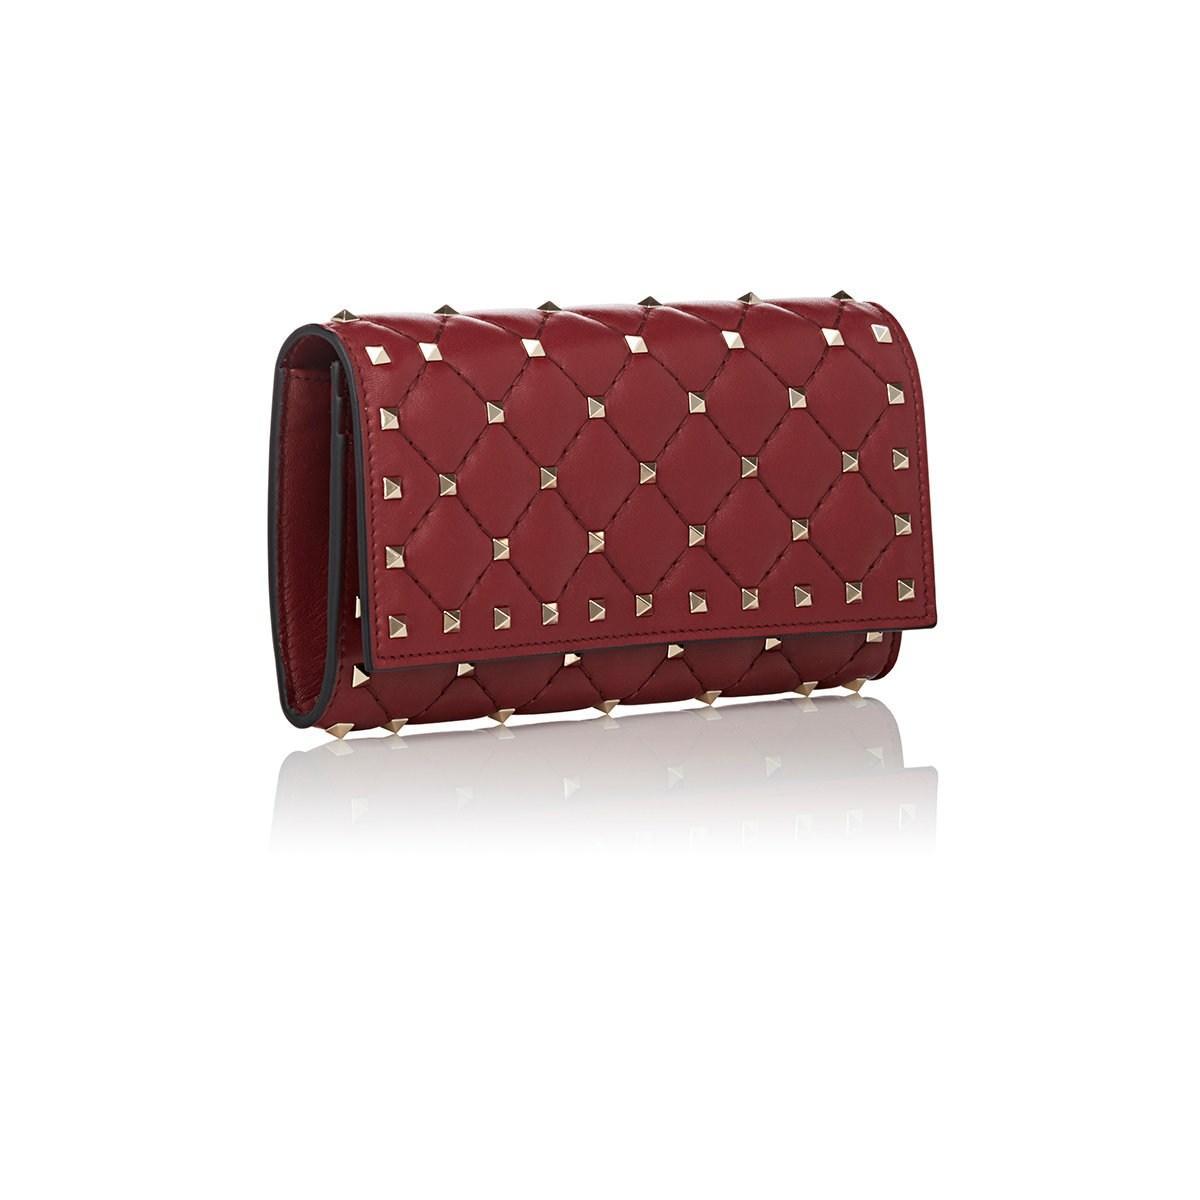 246c9ee8339b Valentino - Red Rockstud Continental Wallet - Lyst. View fullscreen